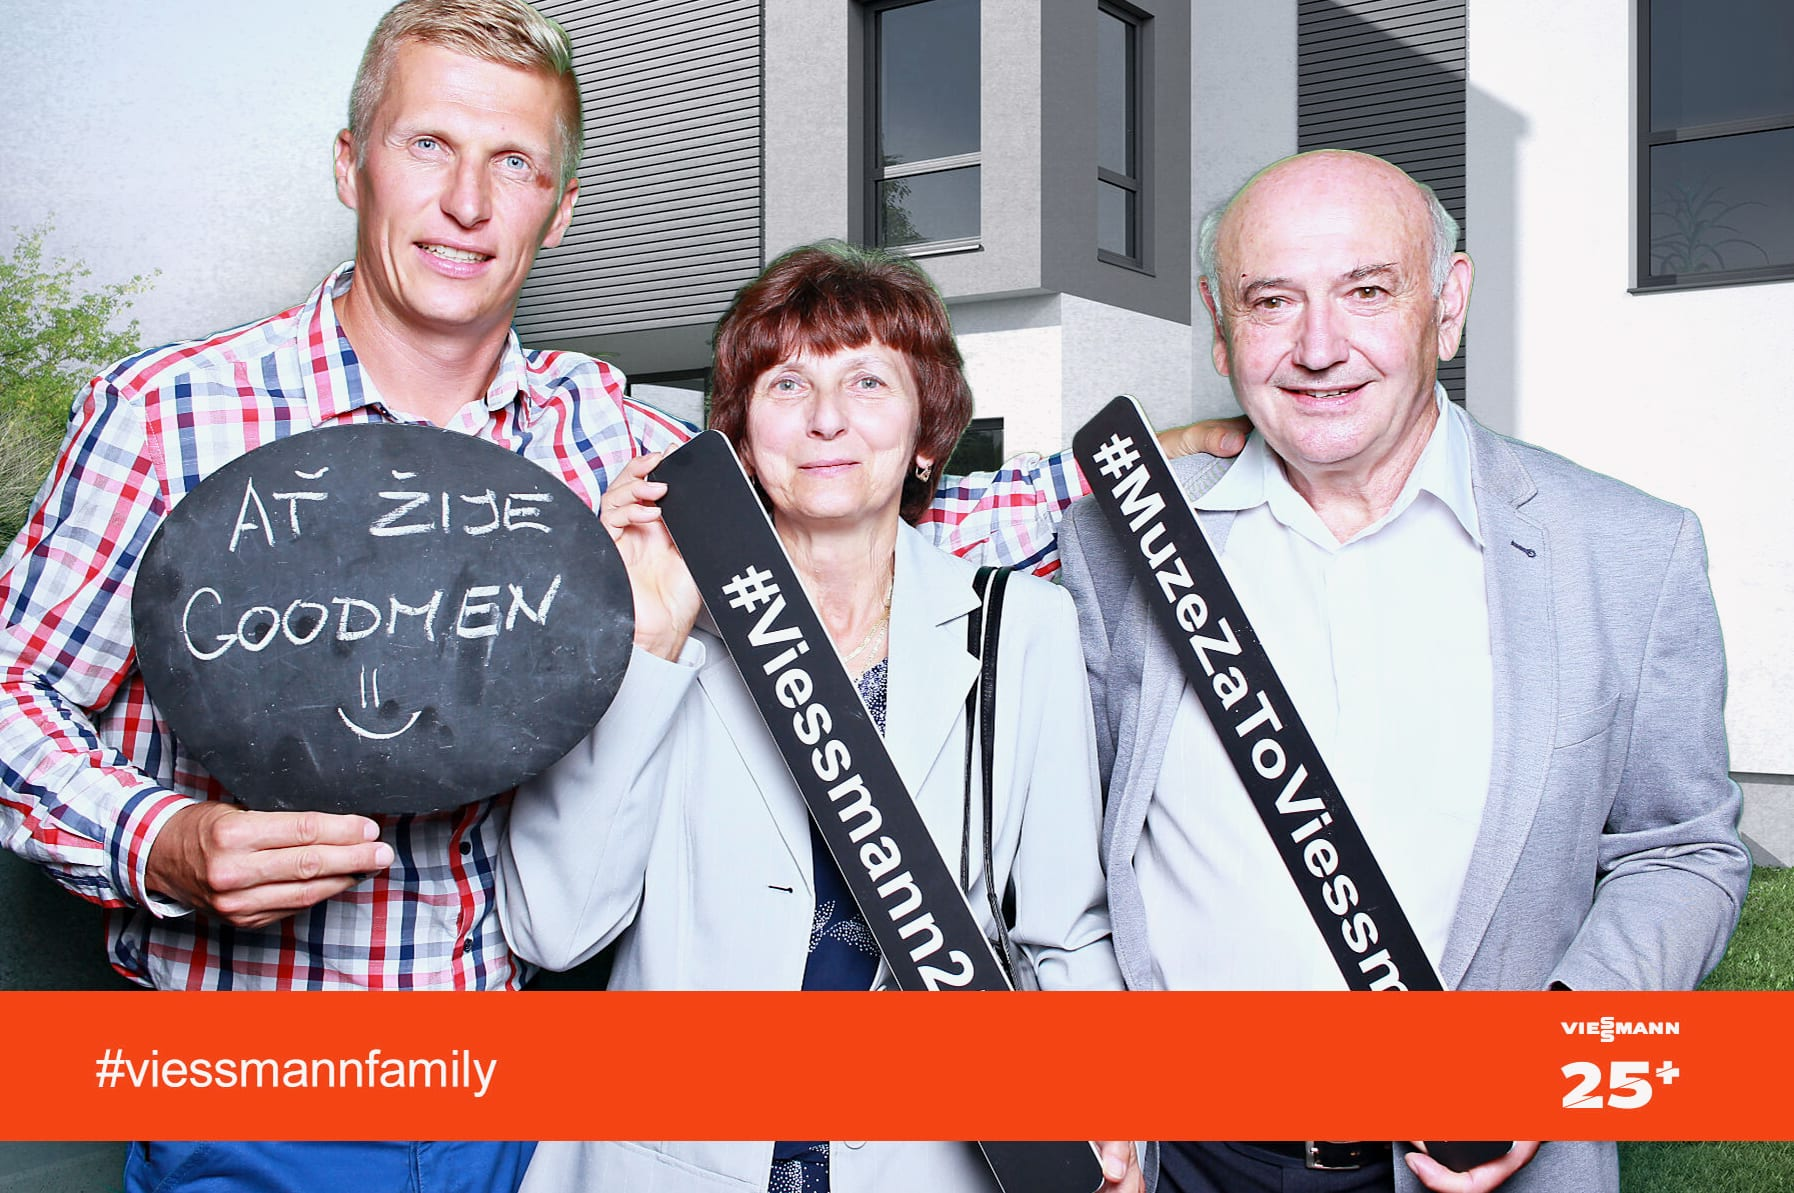 fotokoutek-firemni-vecirek-praha-viessmann-11-9-2019-650006